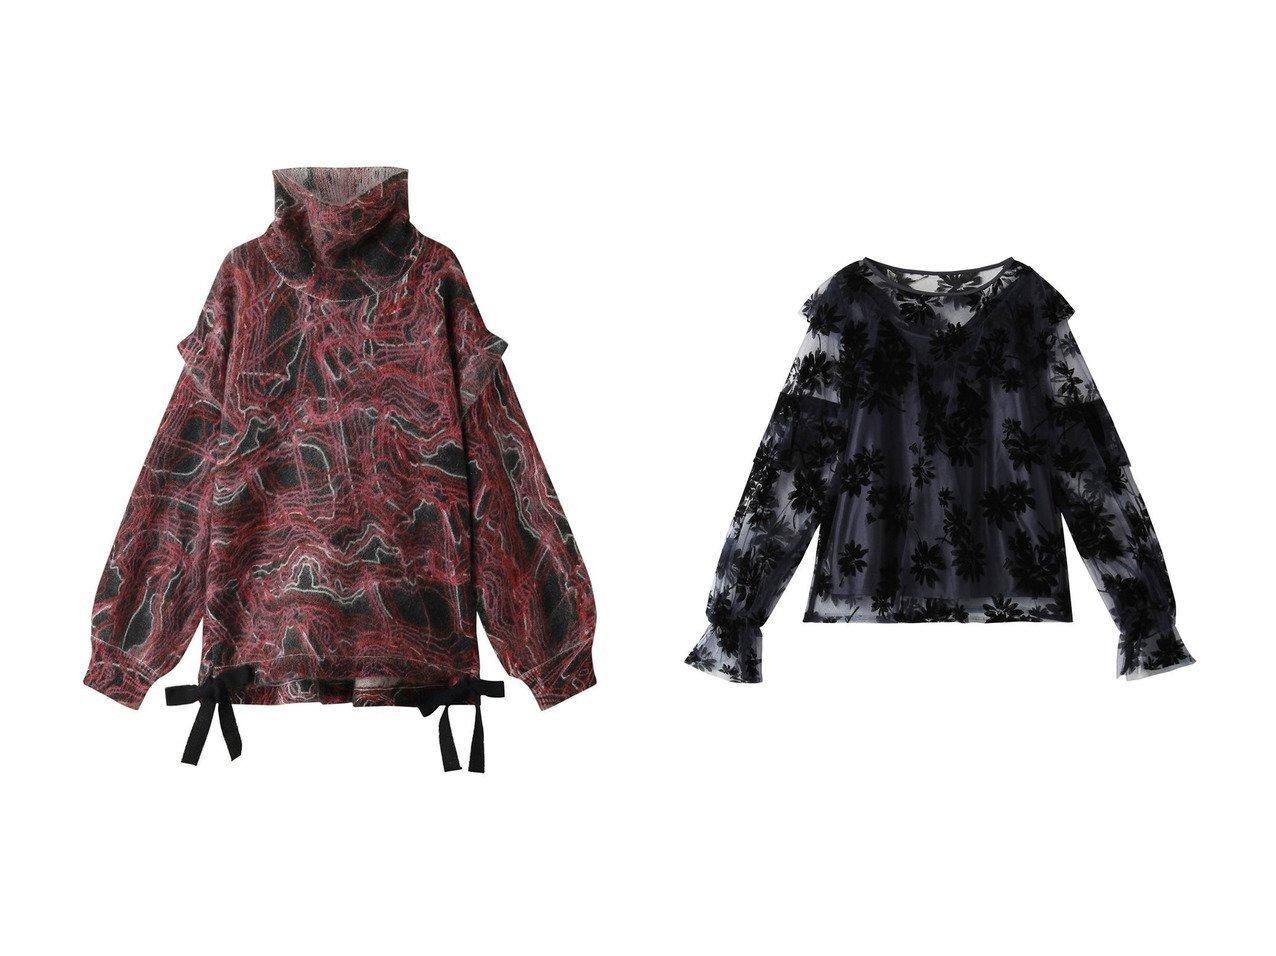 【LANVIN en Bleu/ランバン オン ブルー】のオーロラプリントプルオーバー&フロッキーチュールフリルブラウス トップス・カットソーのおすすめ!人気、トレンド・レディースファッションの通販  おすすめで人気の流行・トレンド、ファッションの通販商品 メンズファッション・キッズファッション・インテリア・家具・レディースファッション・服の通販 founy(ファニー) https://founy.com/ ファッション Fashion レディースファッション WOMEN トップス Tops Tshirt シャツ/ブラウス Shirts Blouses プルオーバー Pullover シンプル スリーブ フリル プリント ボトム リボン ロング  ID:crp329100000016191